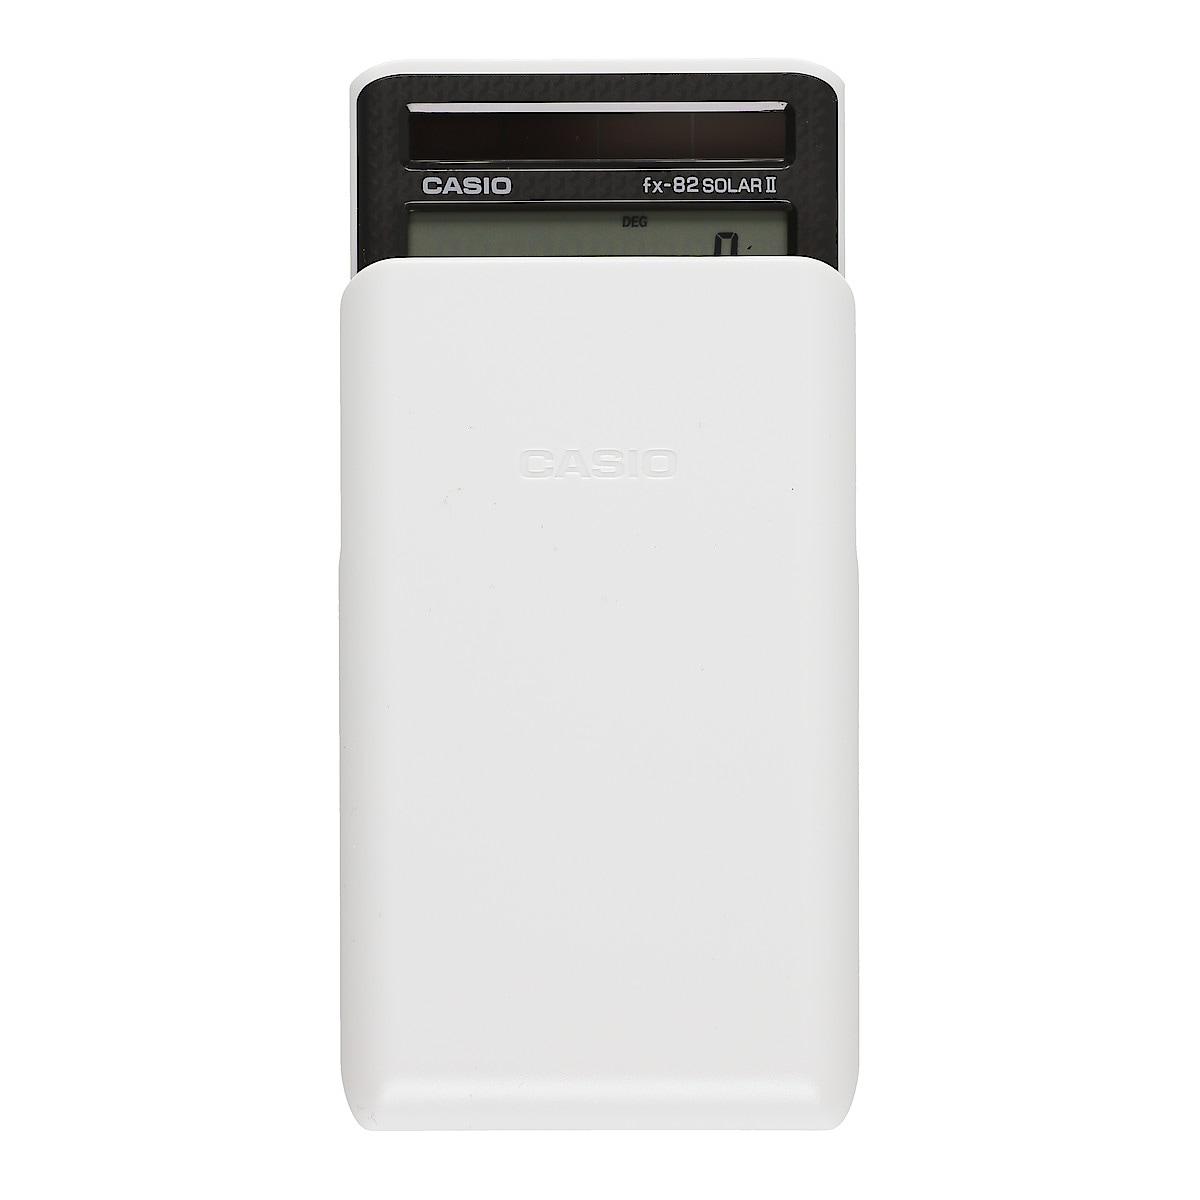 CASIO FX-82 SOLAR II kalkulator